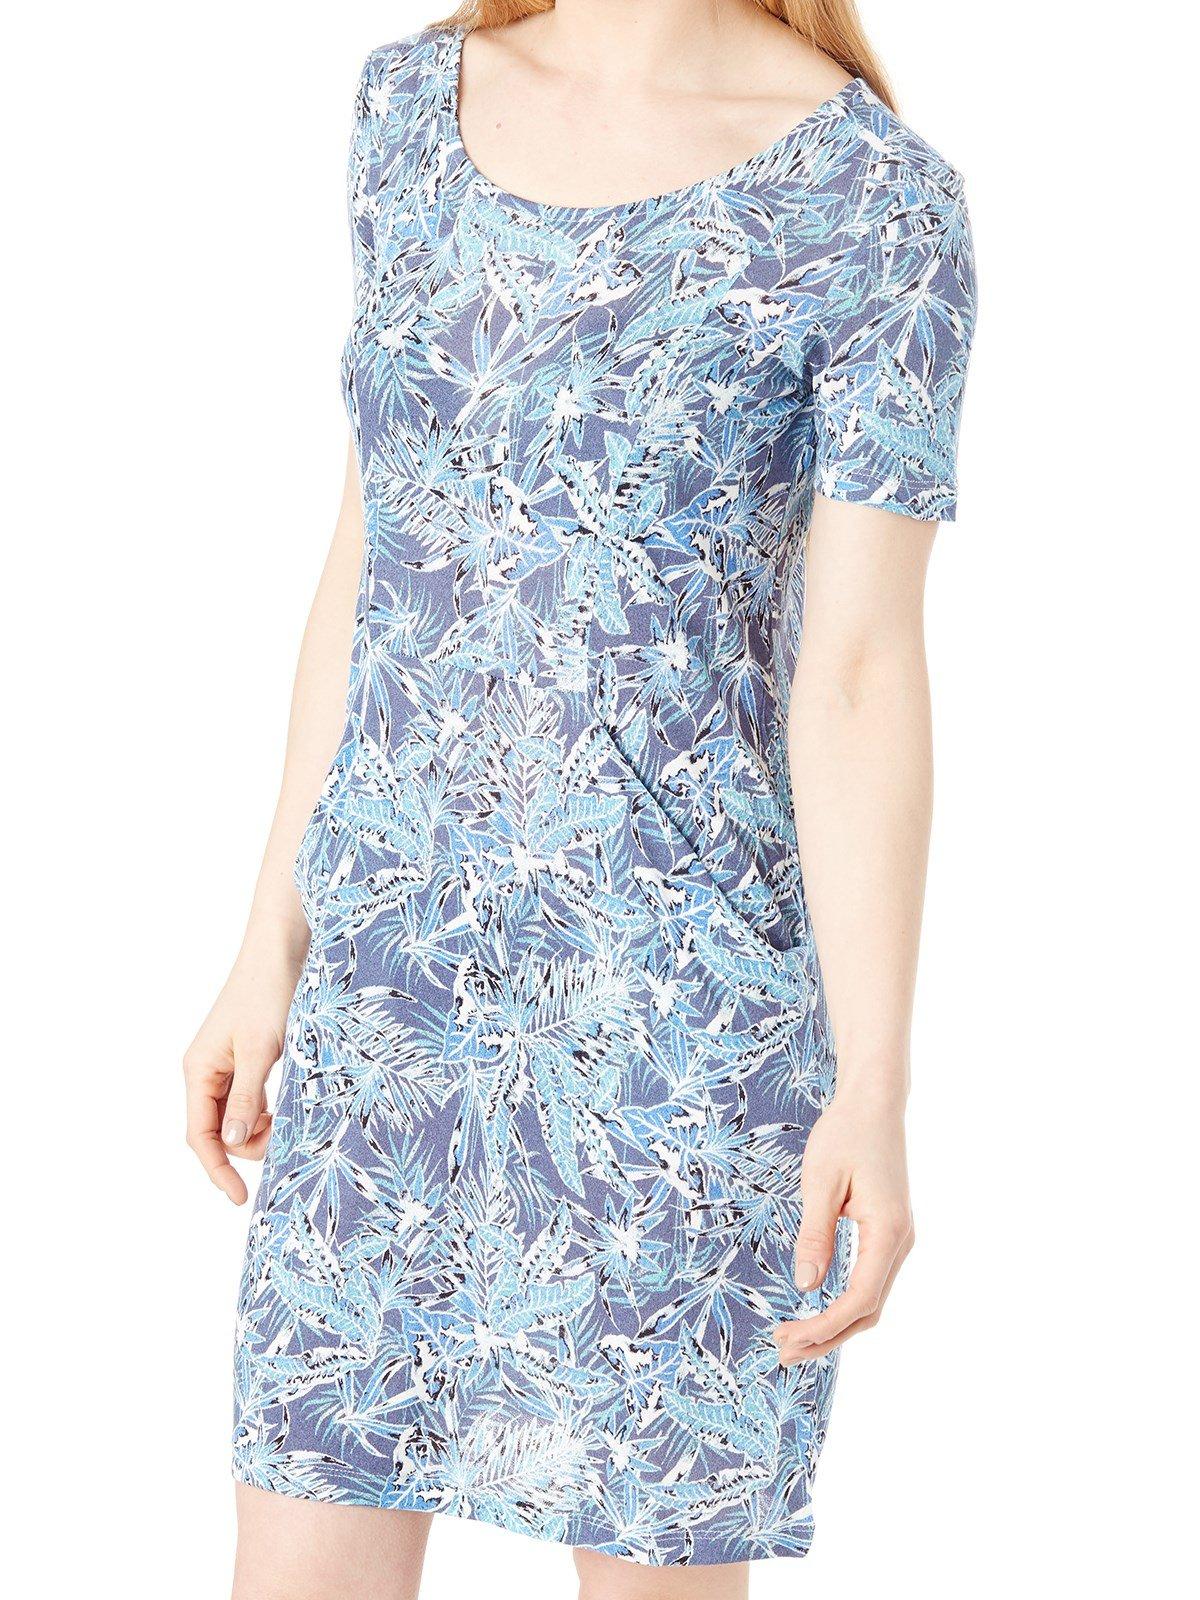 Roxy More Than A Feeling – Vestido Camiseta para Mujer ERJKD03097